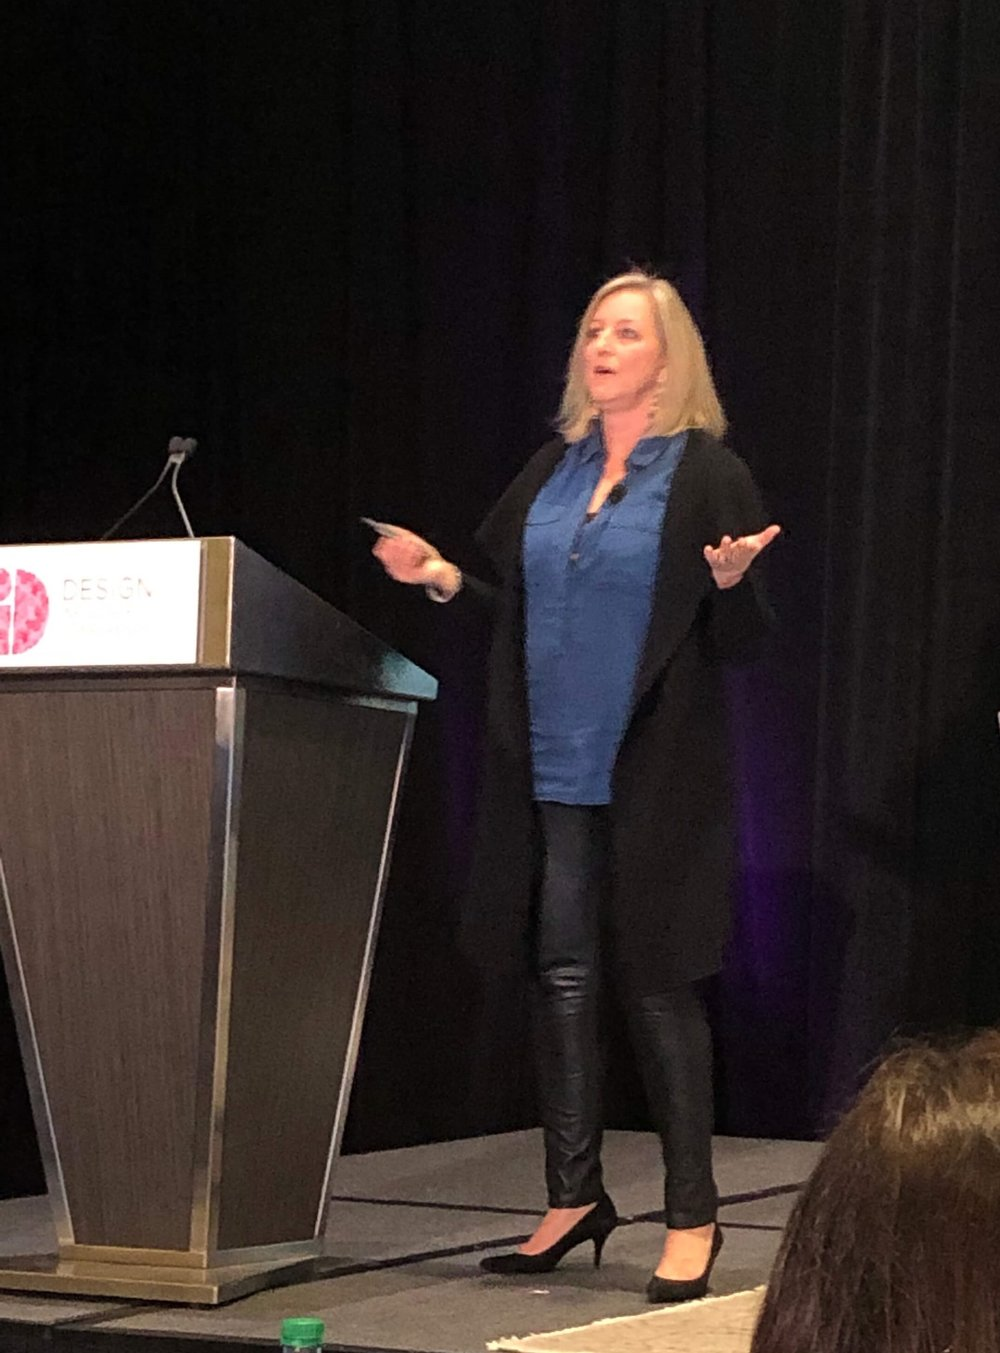 Speaker Deborah von Donop at Design Influencer's Conference 2019